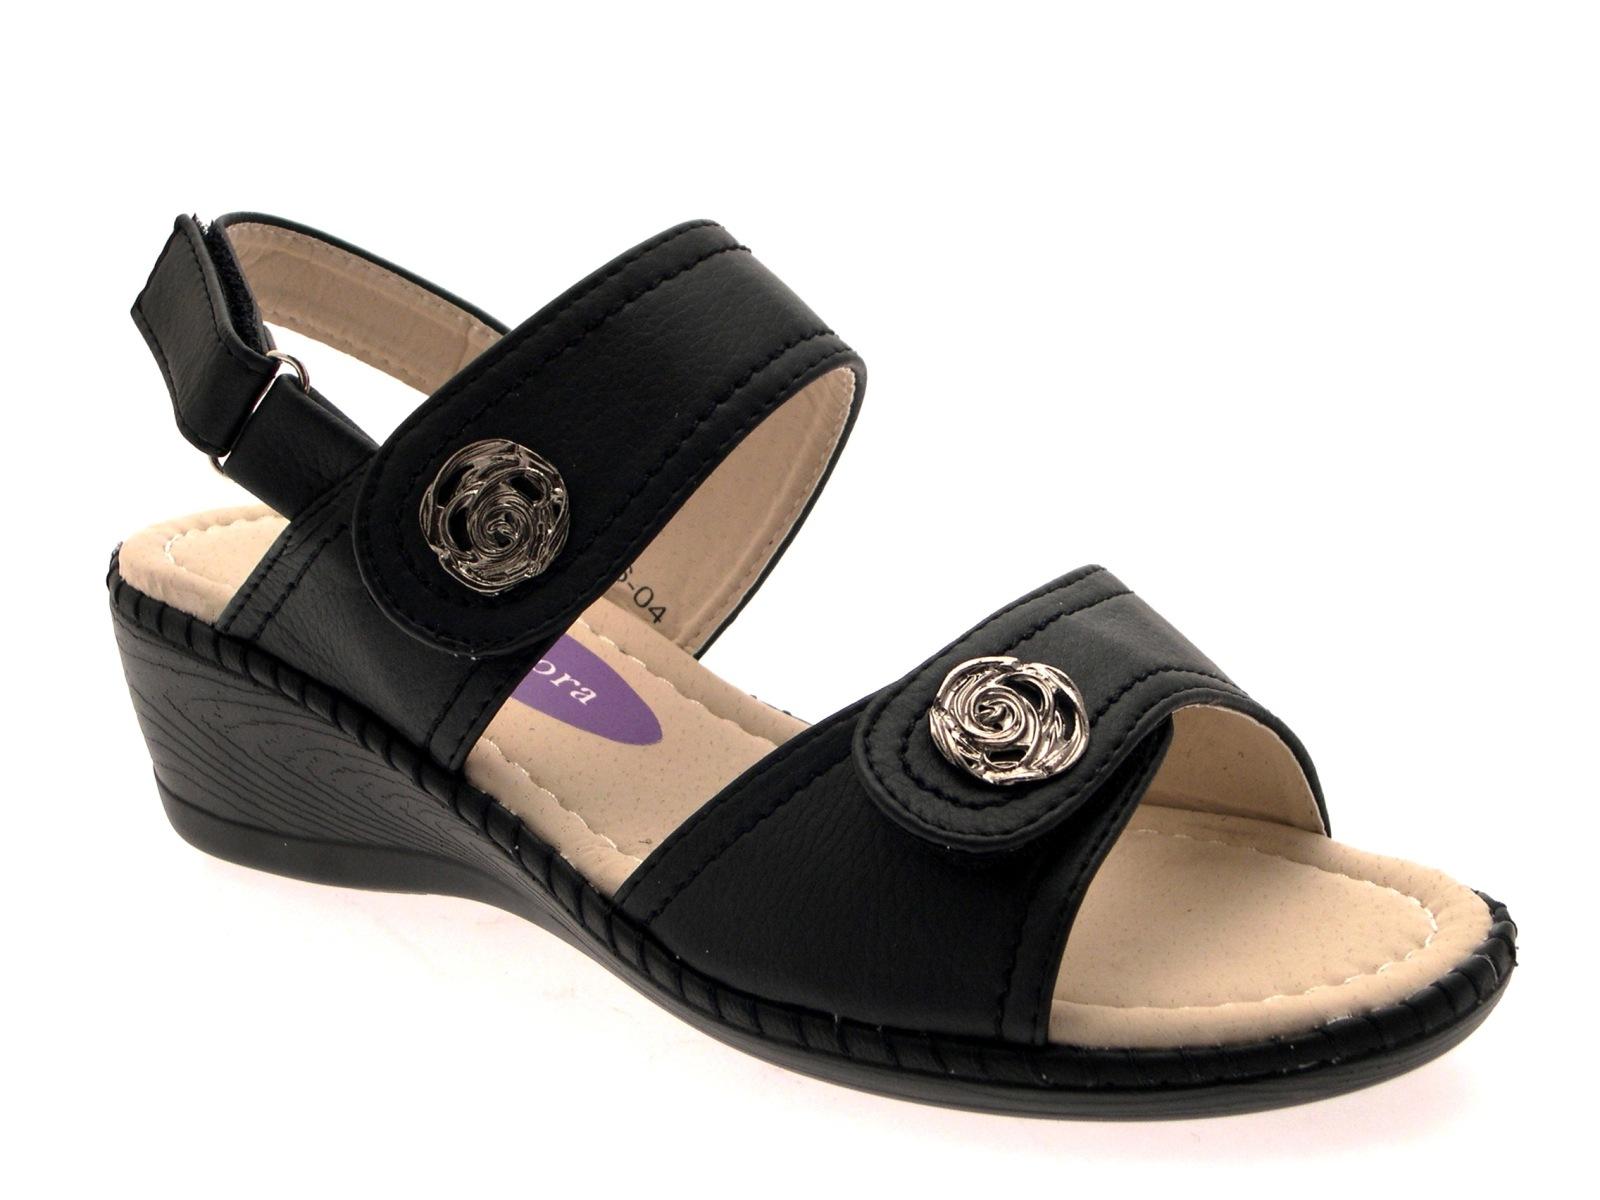 Lastest WOMENS COMFORT WIDE LOW WEDGE VELCRO STRAPS SHOES SANDALS LADIES SIZE UK 3 - 8   EBay